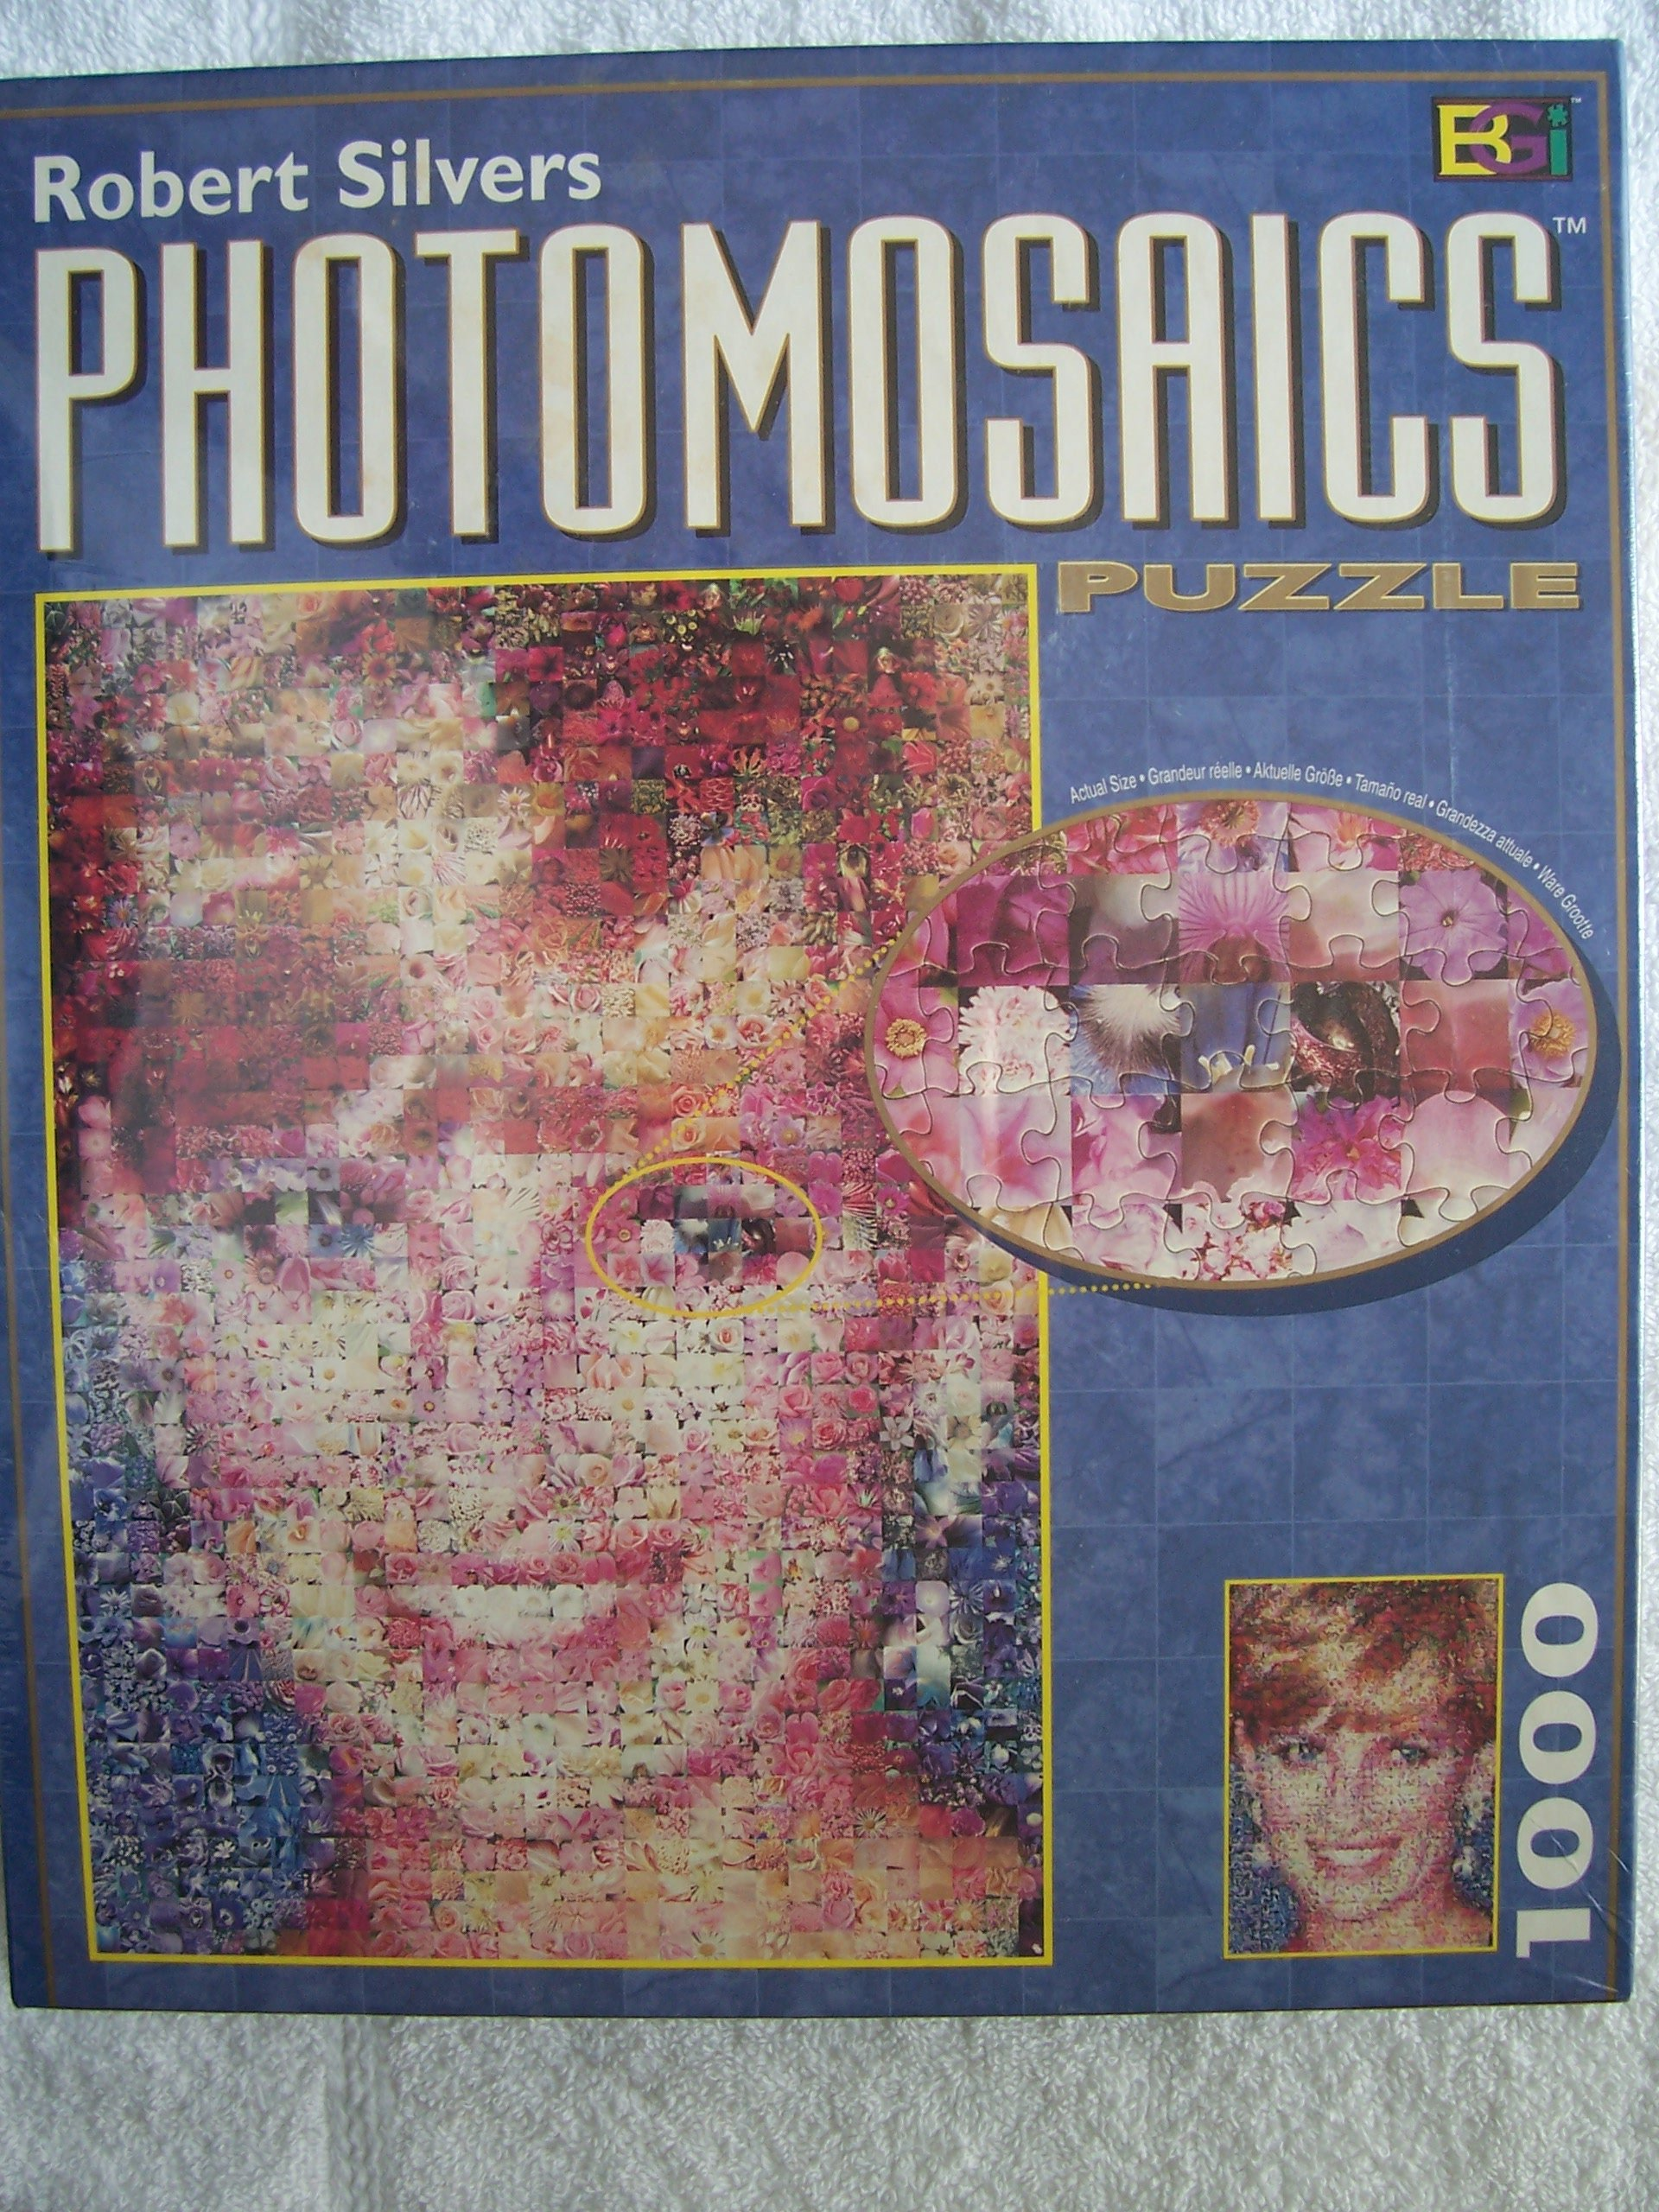 Photomosaic Jigsaw Puzzle Diana Amazon Sg Toys Games